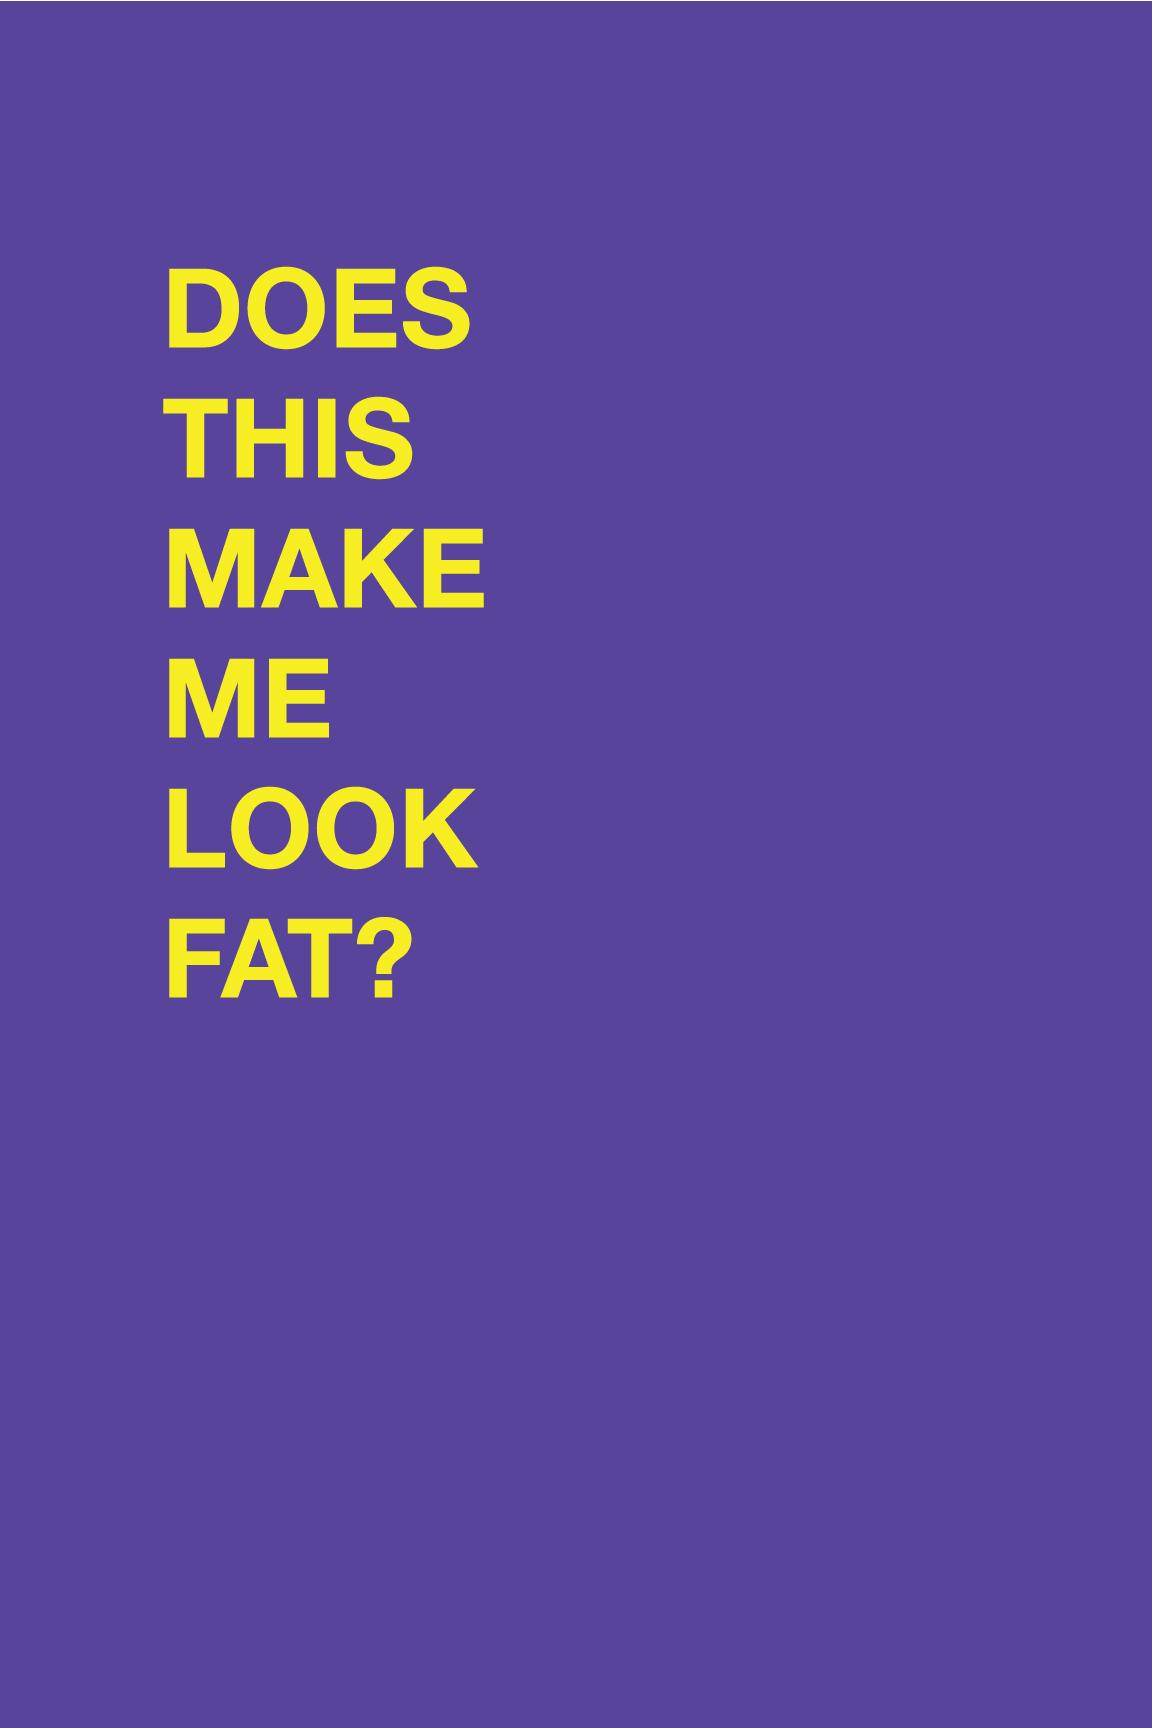 look-fat.jpg